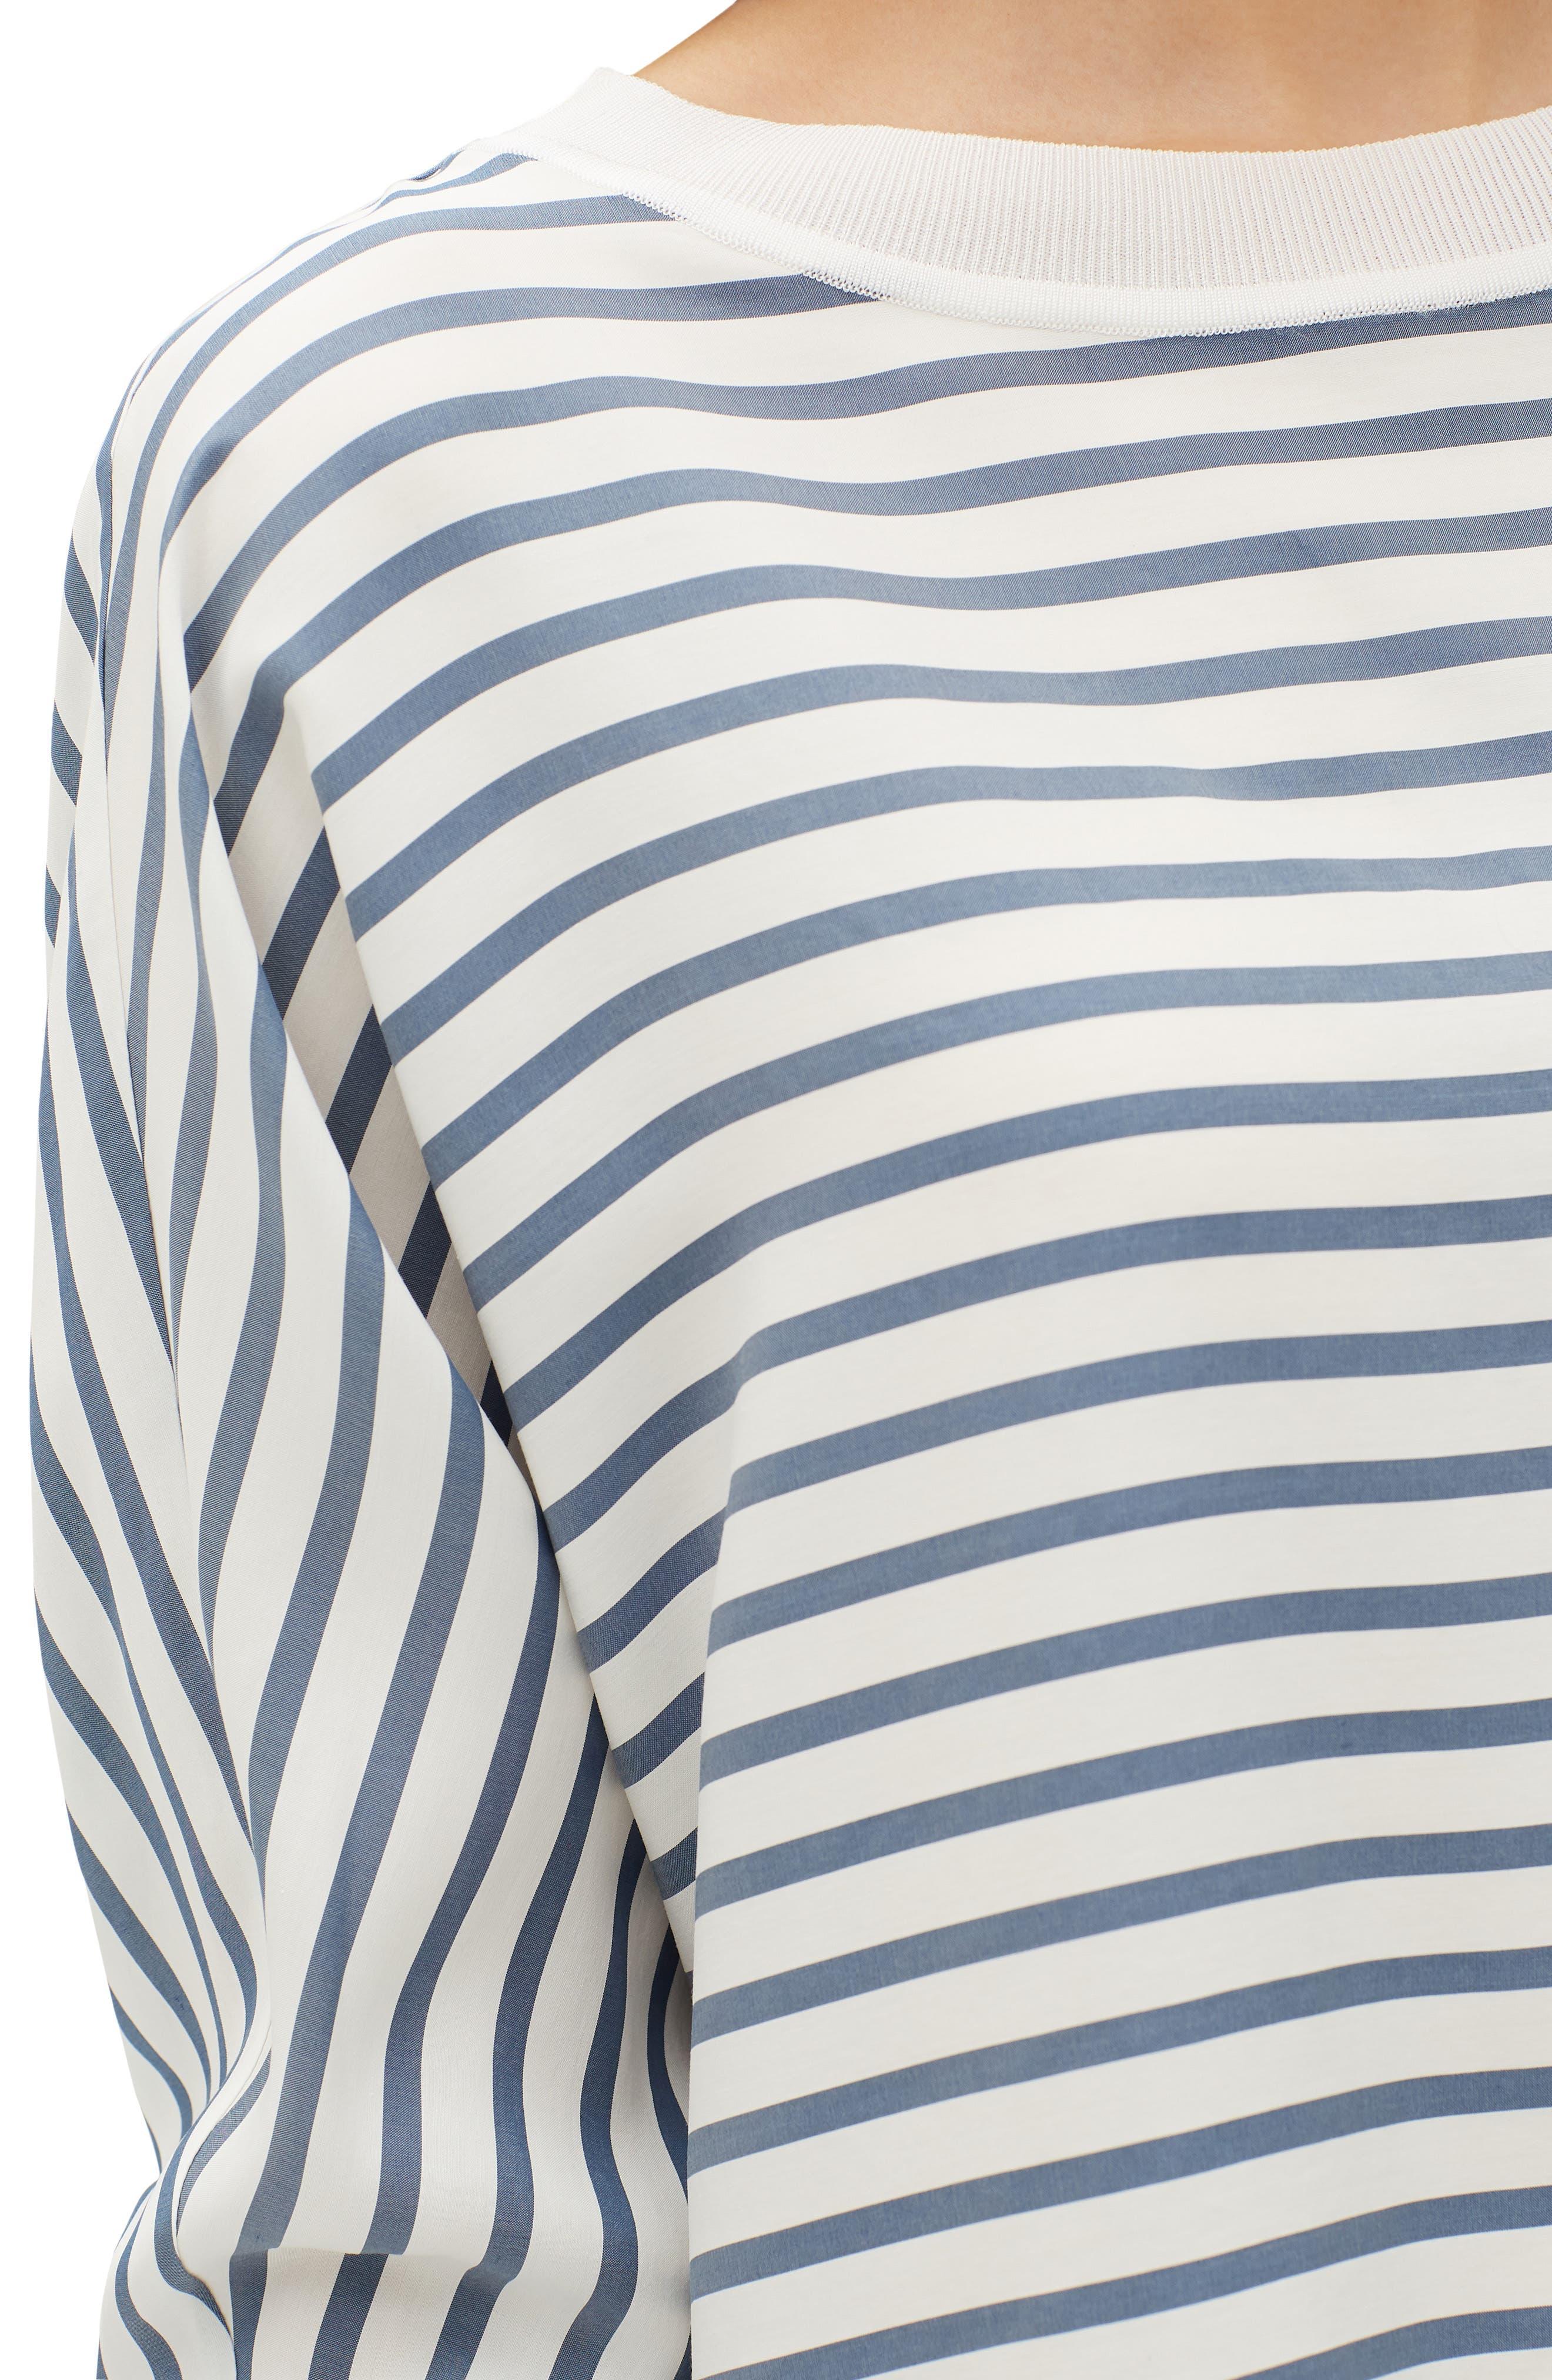 Joplin Stripe Silk Blouse,                             Alternate thumbnail 3, color,                             400